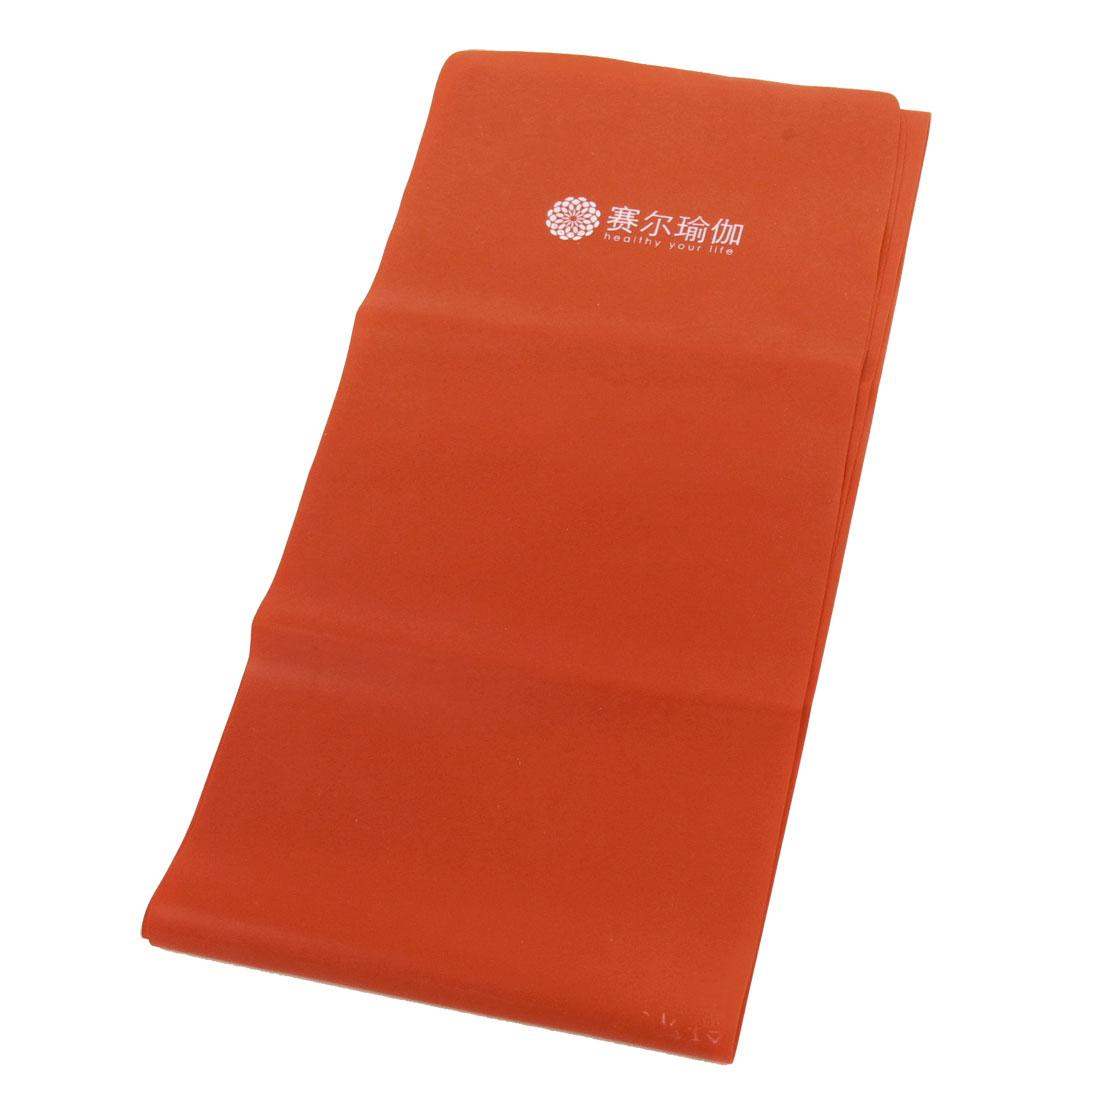 1.2m Long Shoulder Extension Body Exercise Elastic Bandage Orange Red